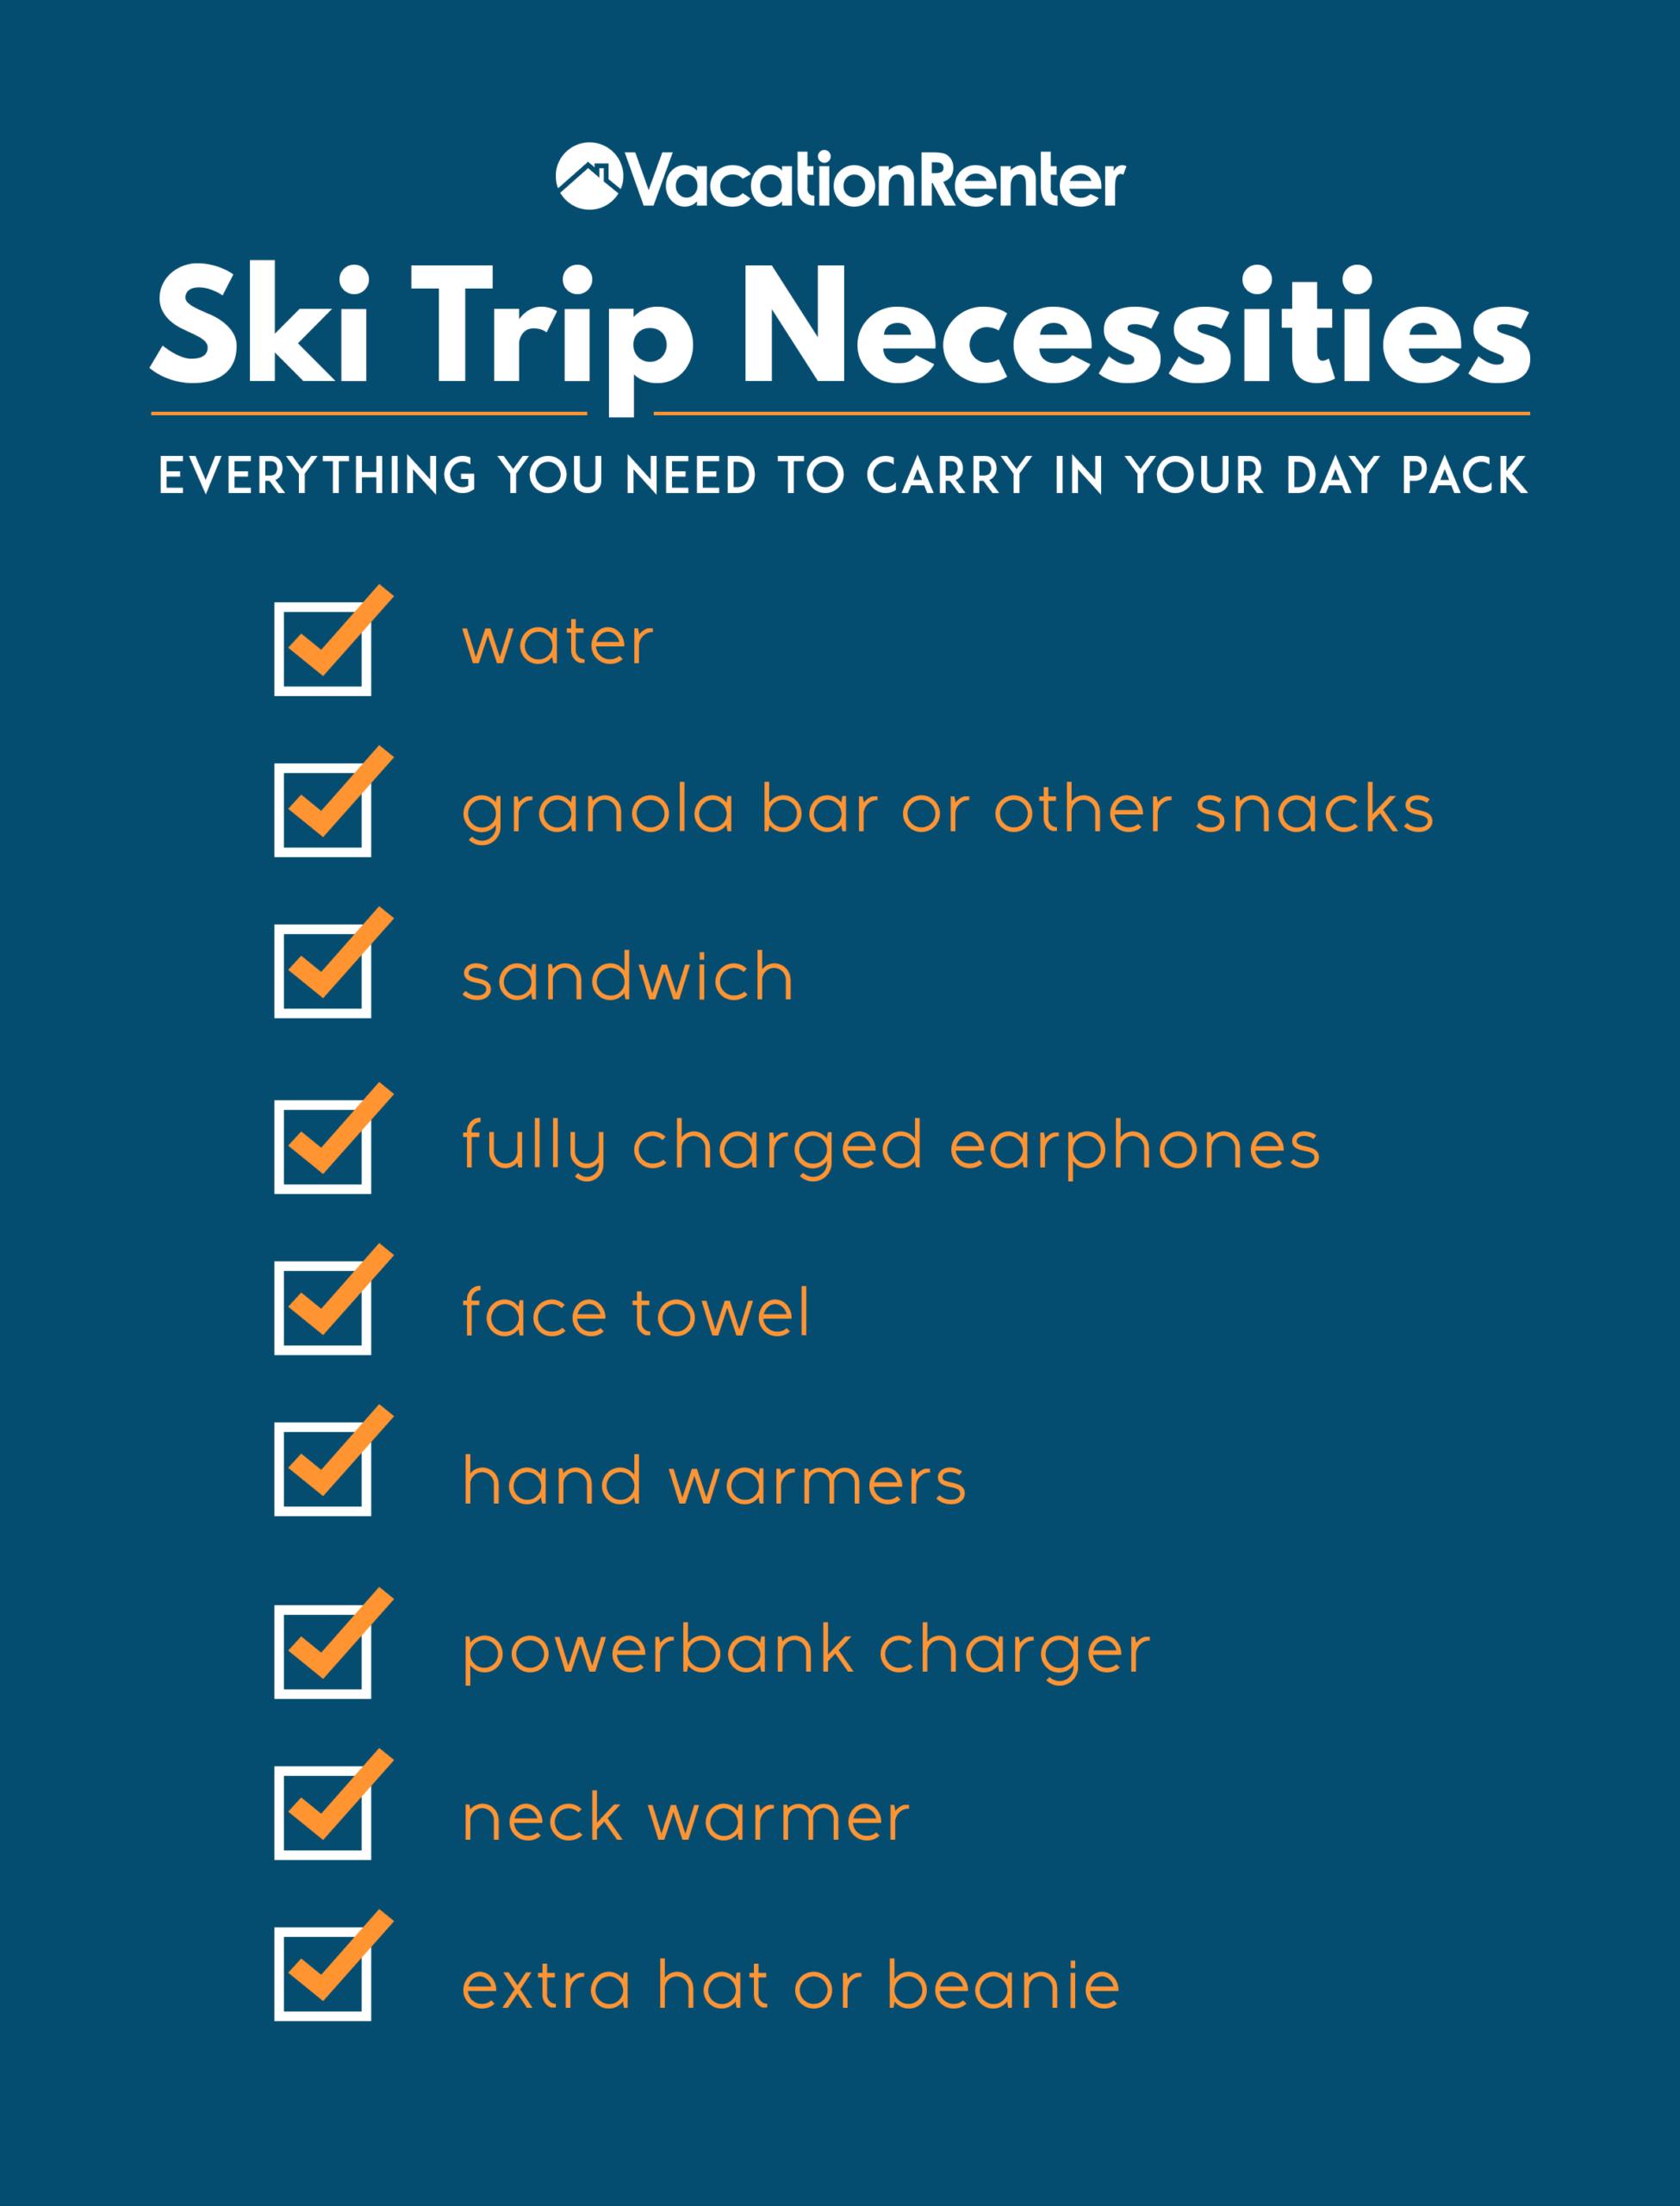 ski-trip-day-pack-essentials-list